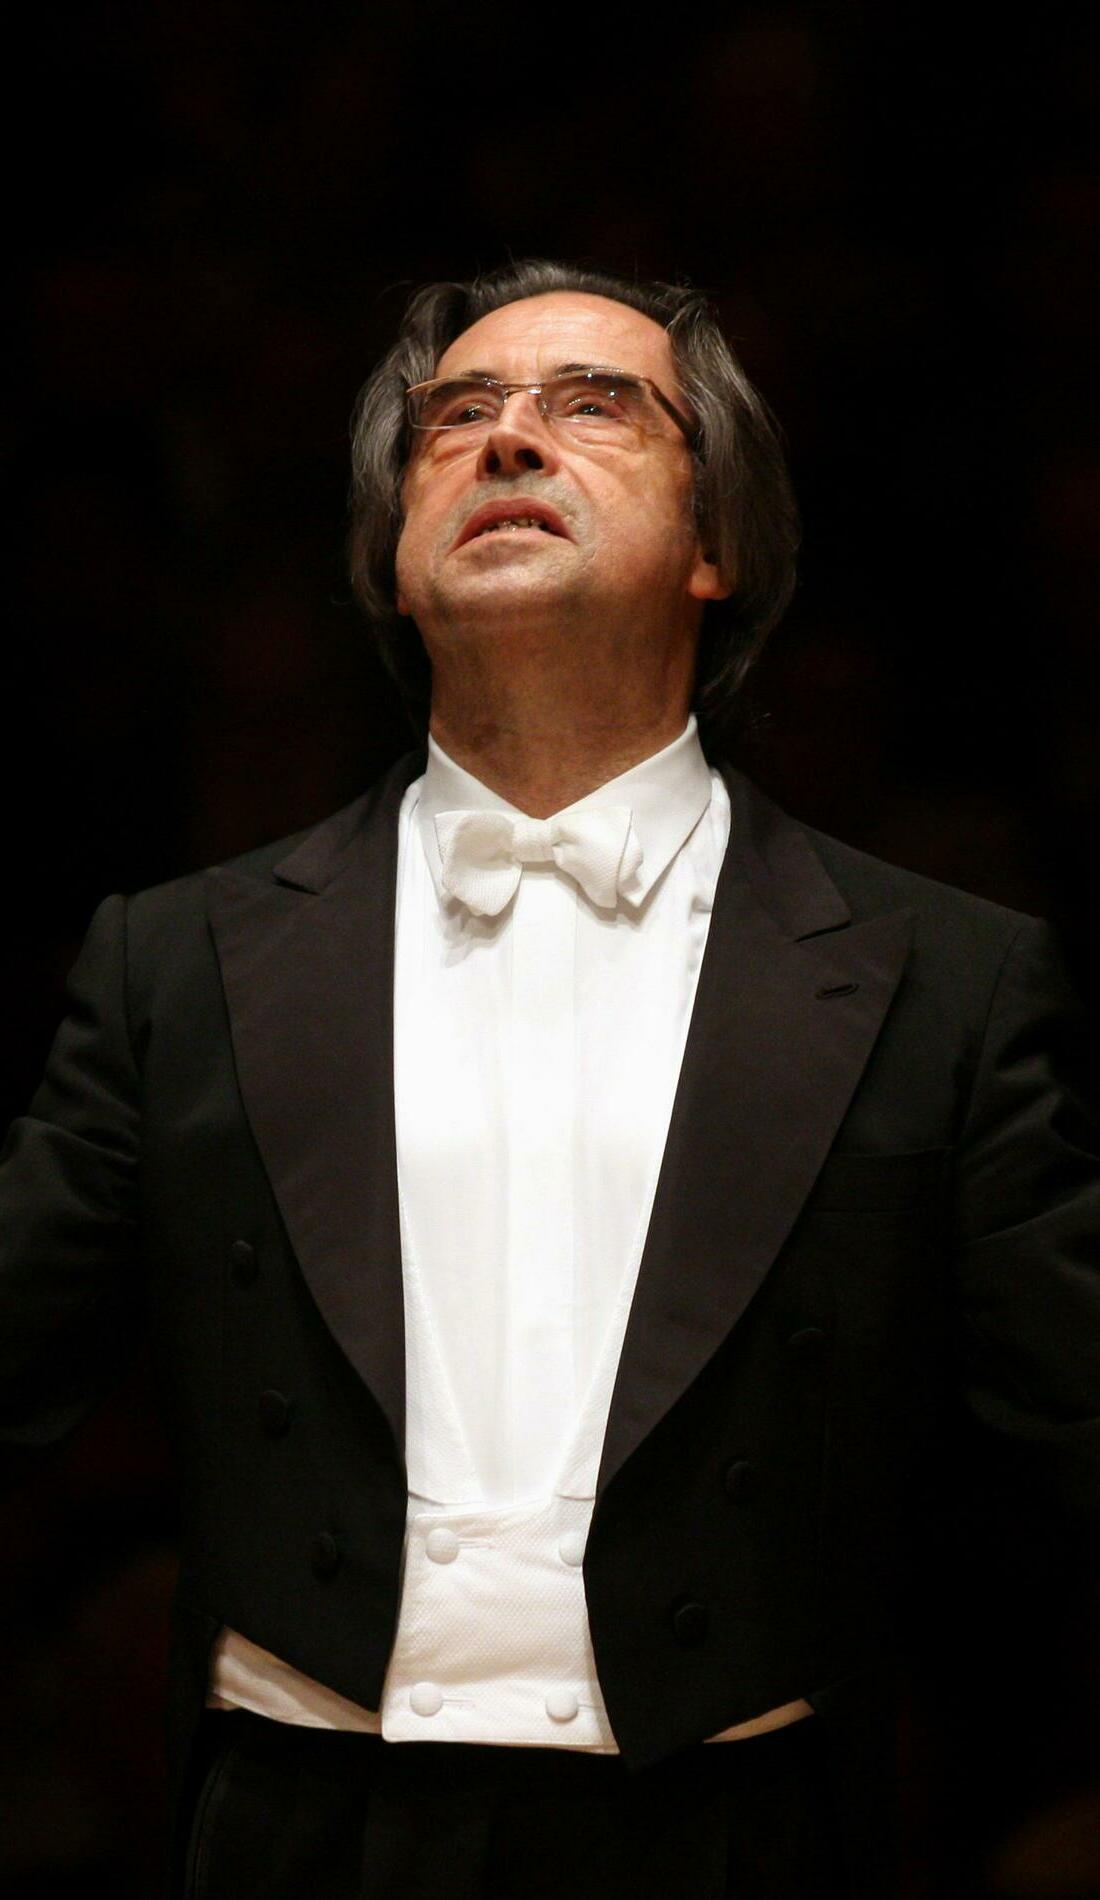 A Riccardo Muti live event